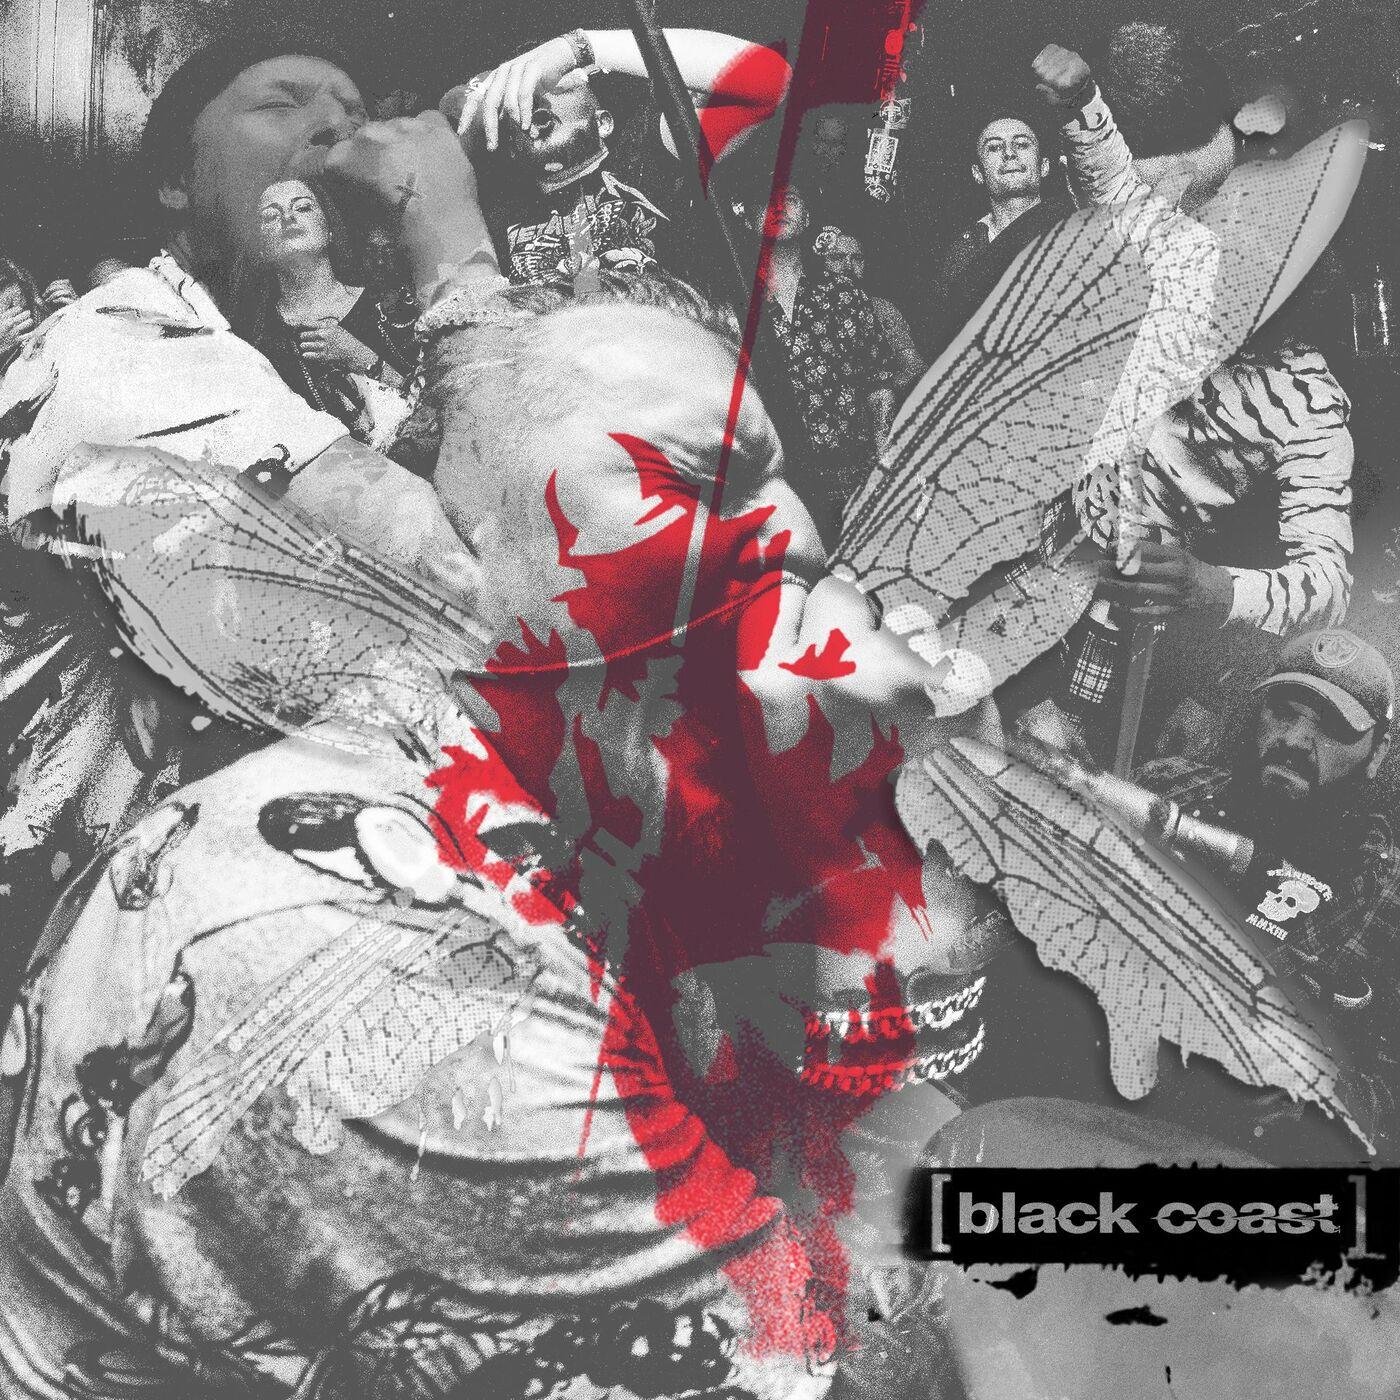 Black Coast - A Place for My Head [single] (2020)